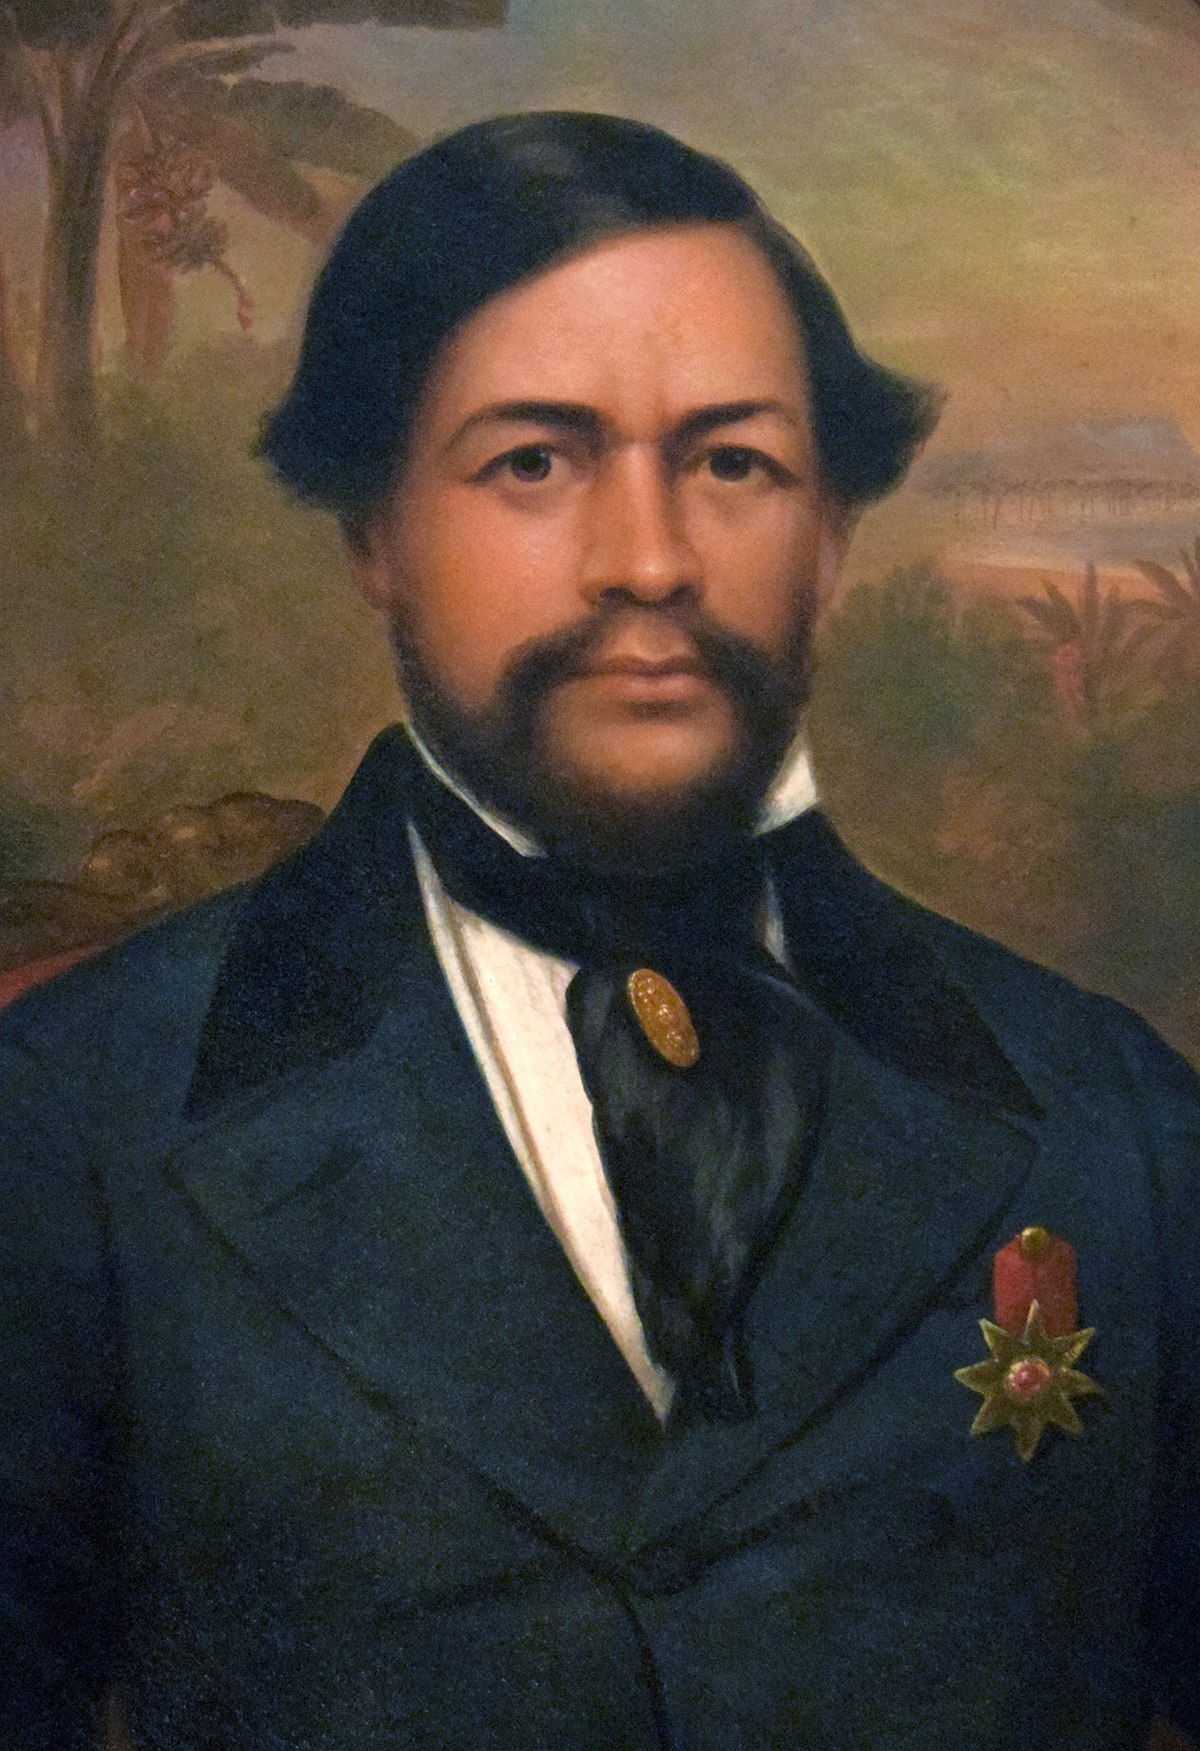 Alexander Mau kamehameha iii - wikipedia